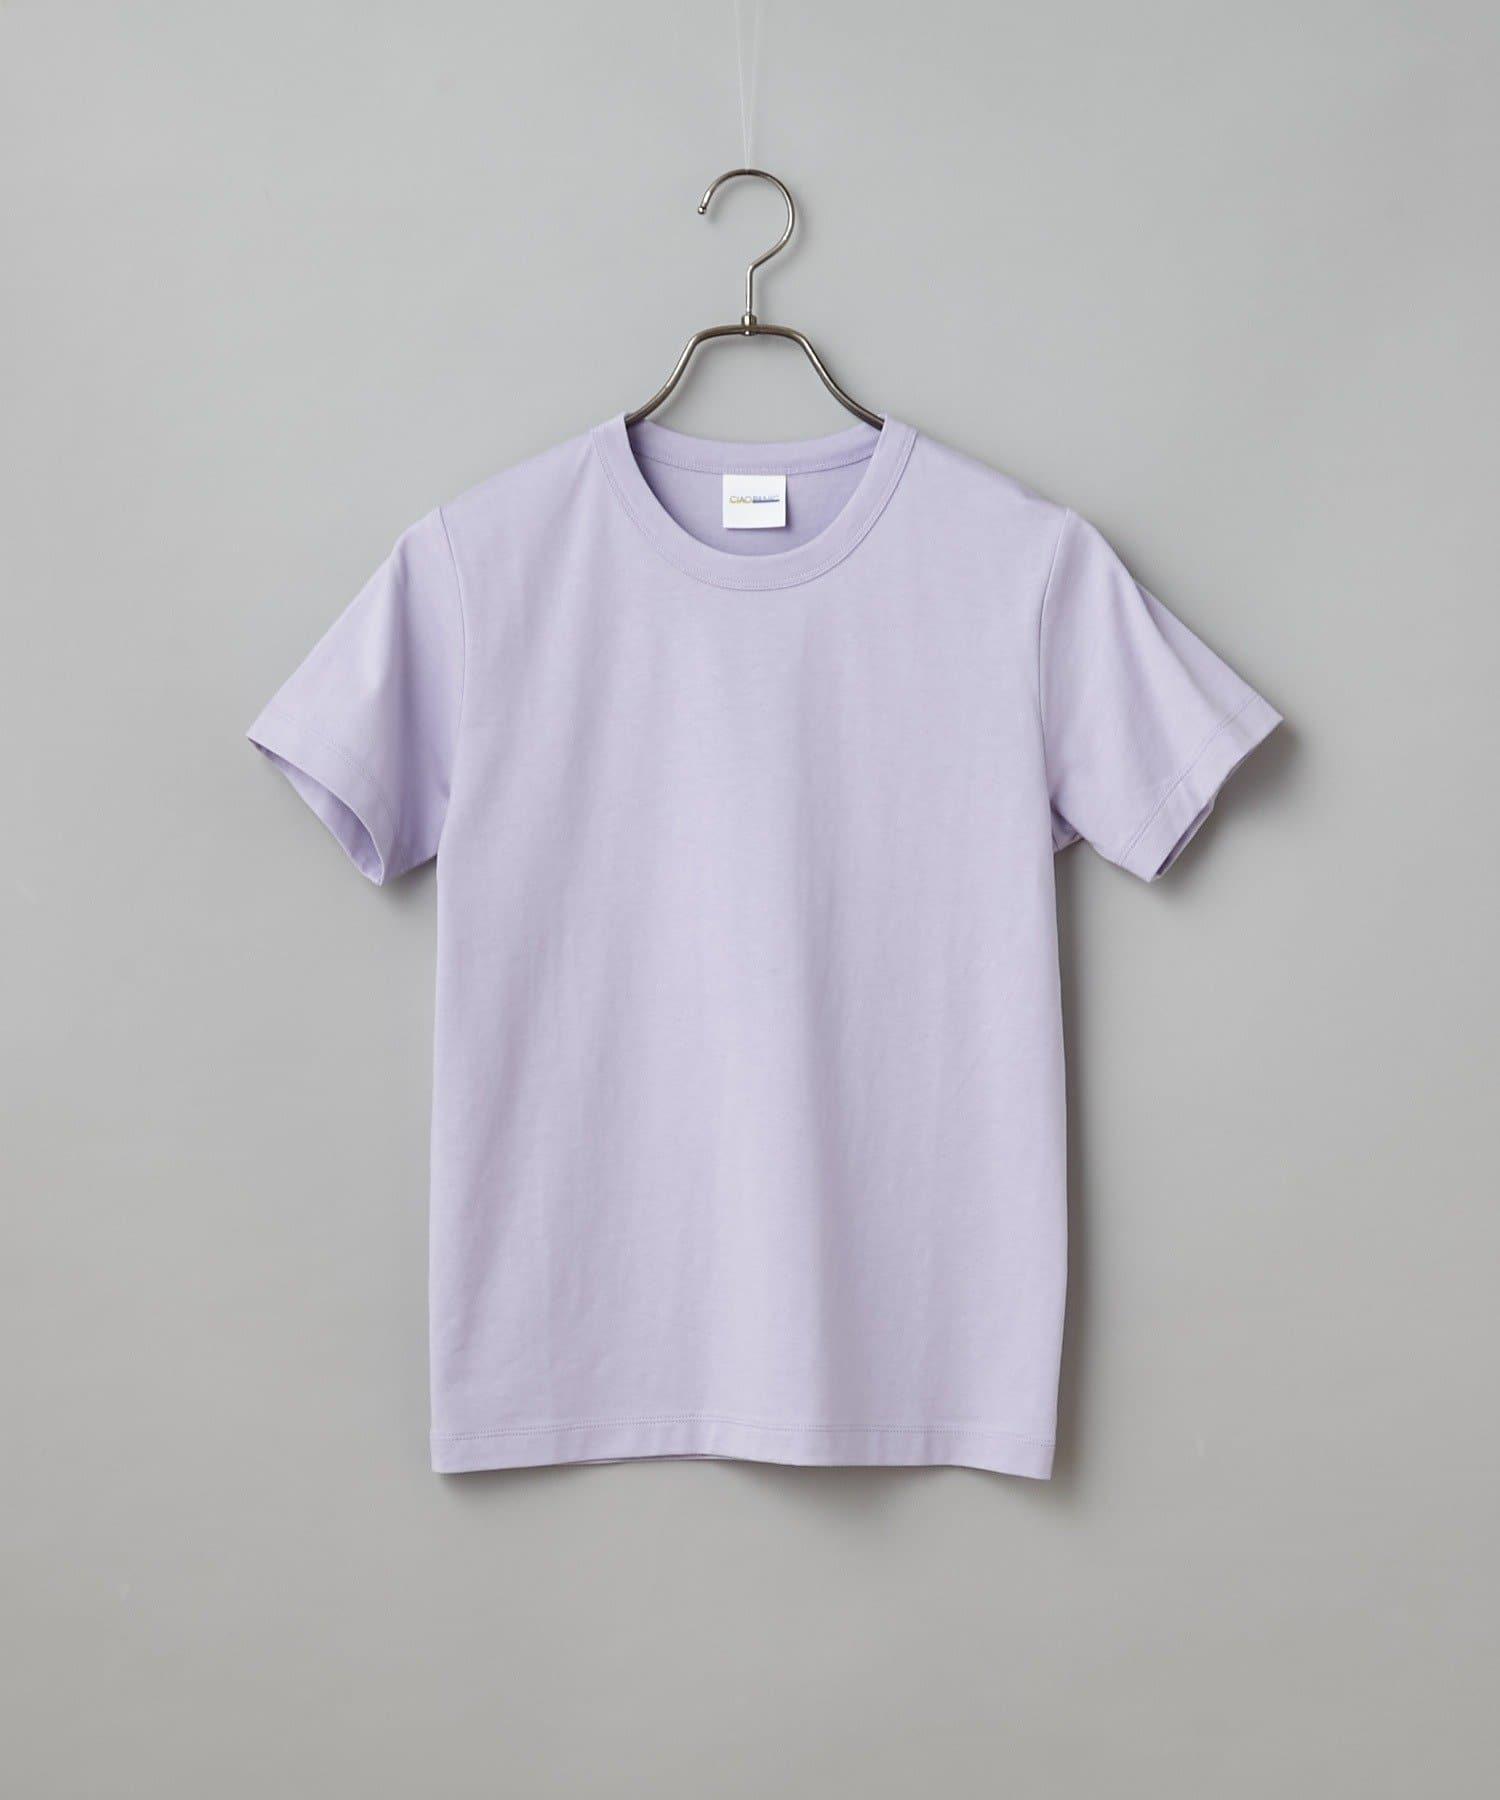 CIAOPANIC(チャオパニック) バイオ加工レギュラーコットンコンパクトTシャツ